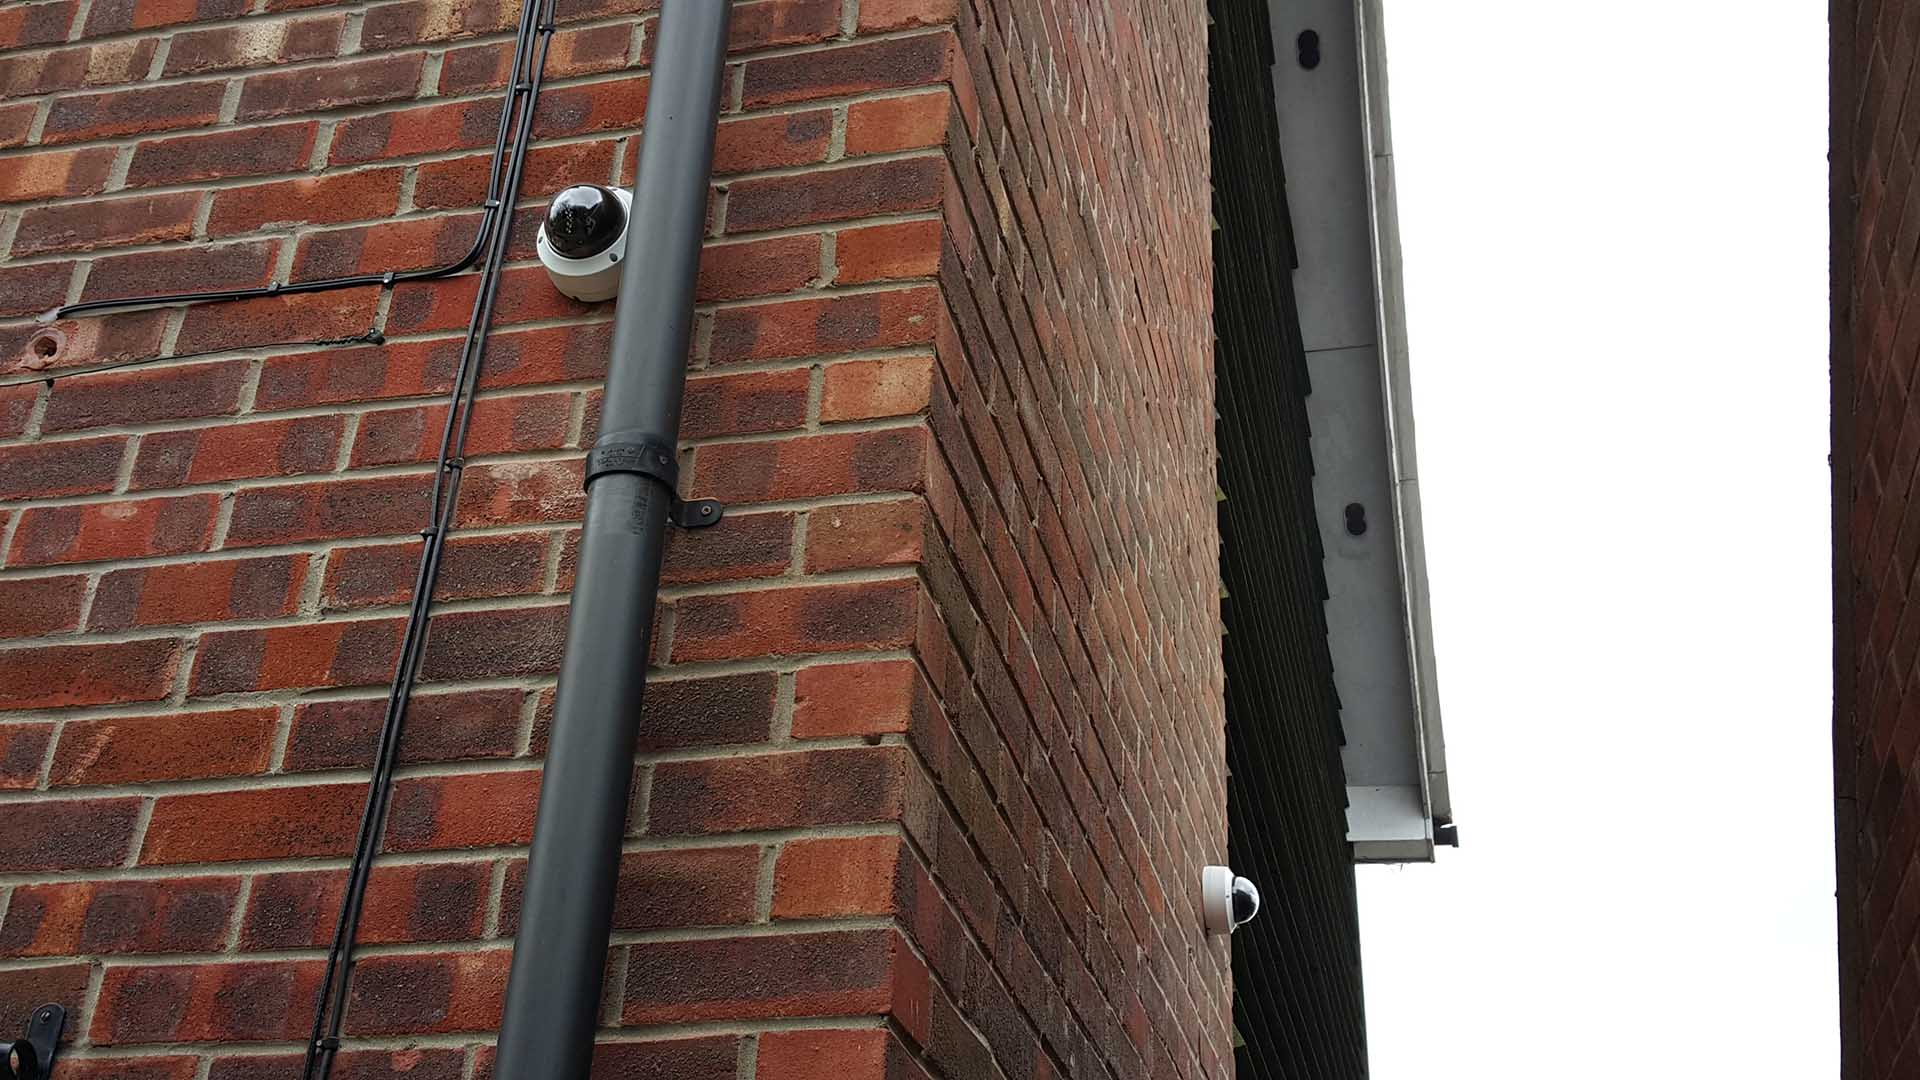 CCTV Installation in Laindon